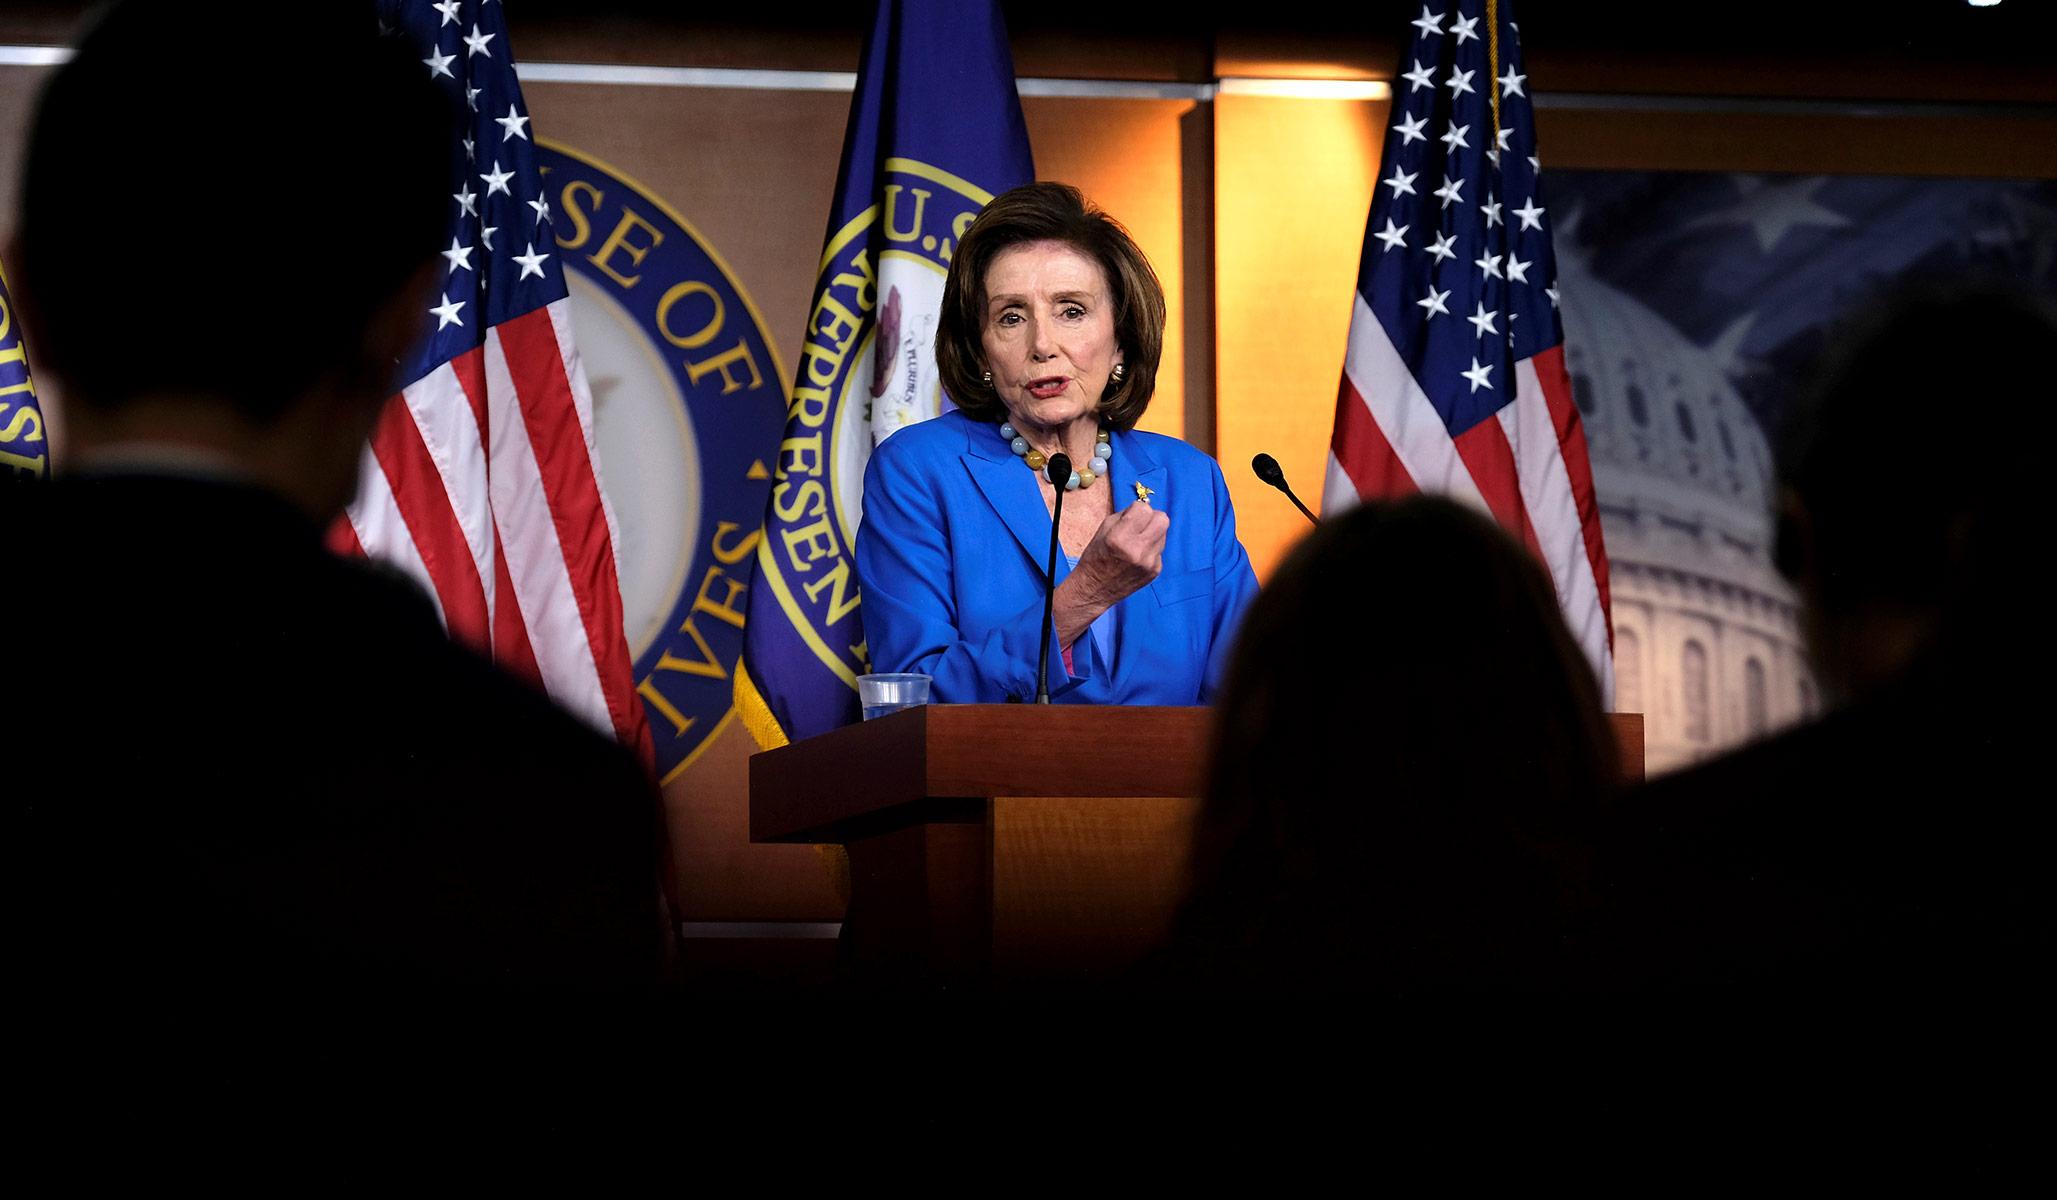 CBO: Pengeluaran Tinggi Menyebabkan Defisit, Bukan Pajak Rendah